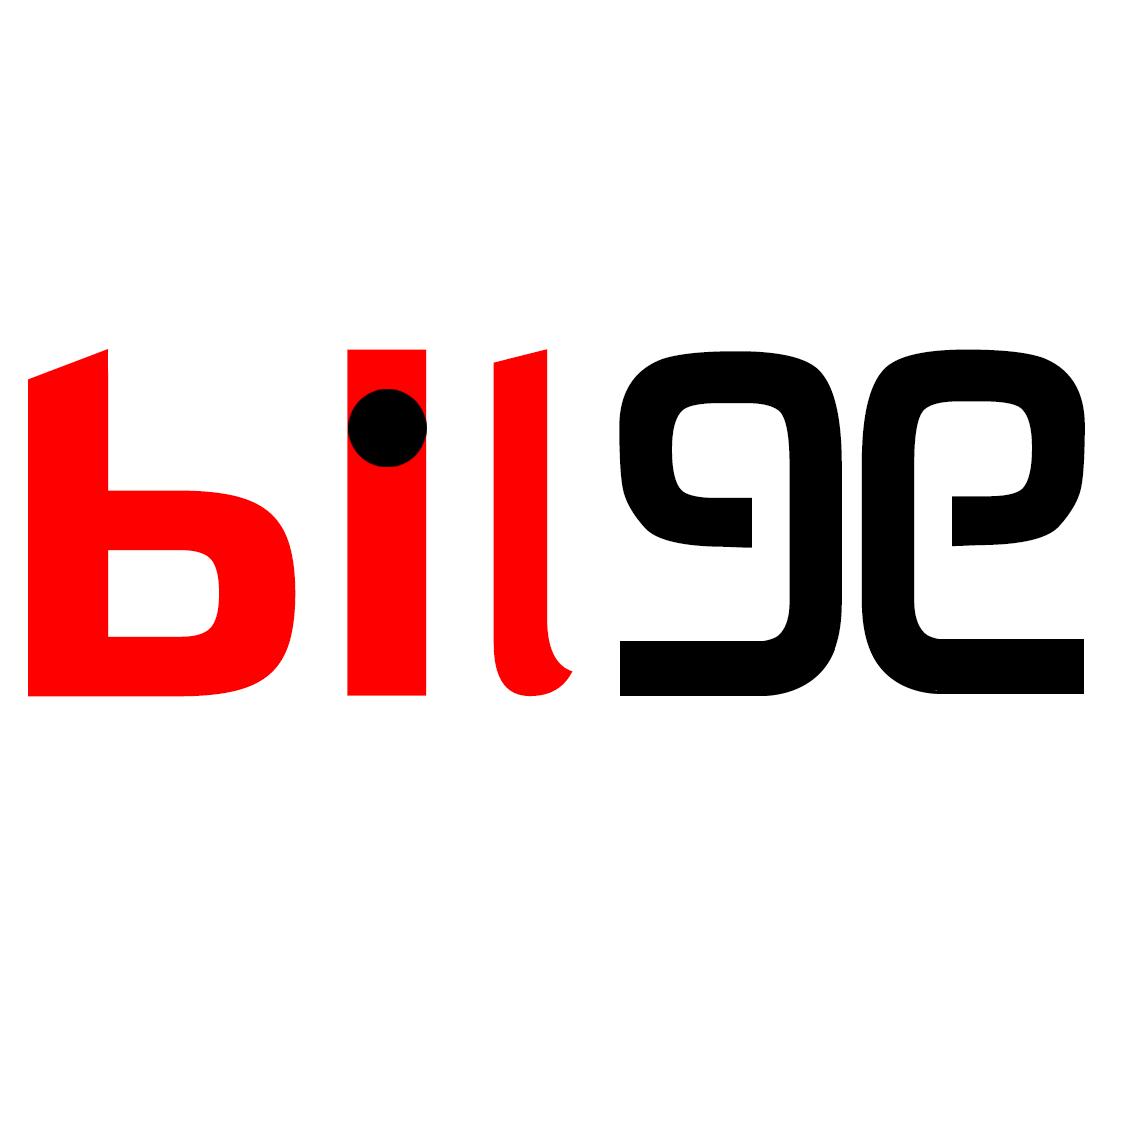 bilgehanoz1453